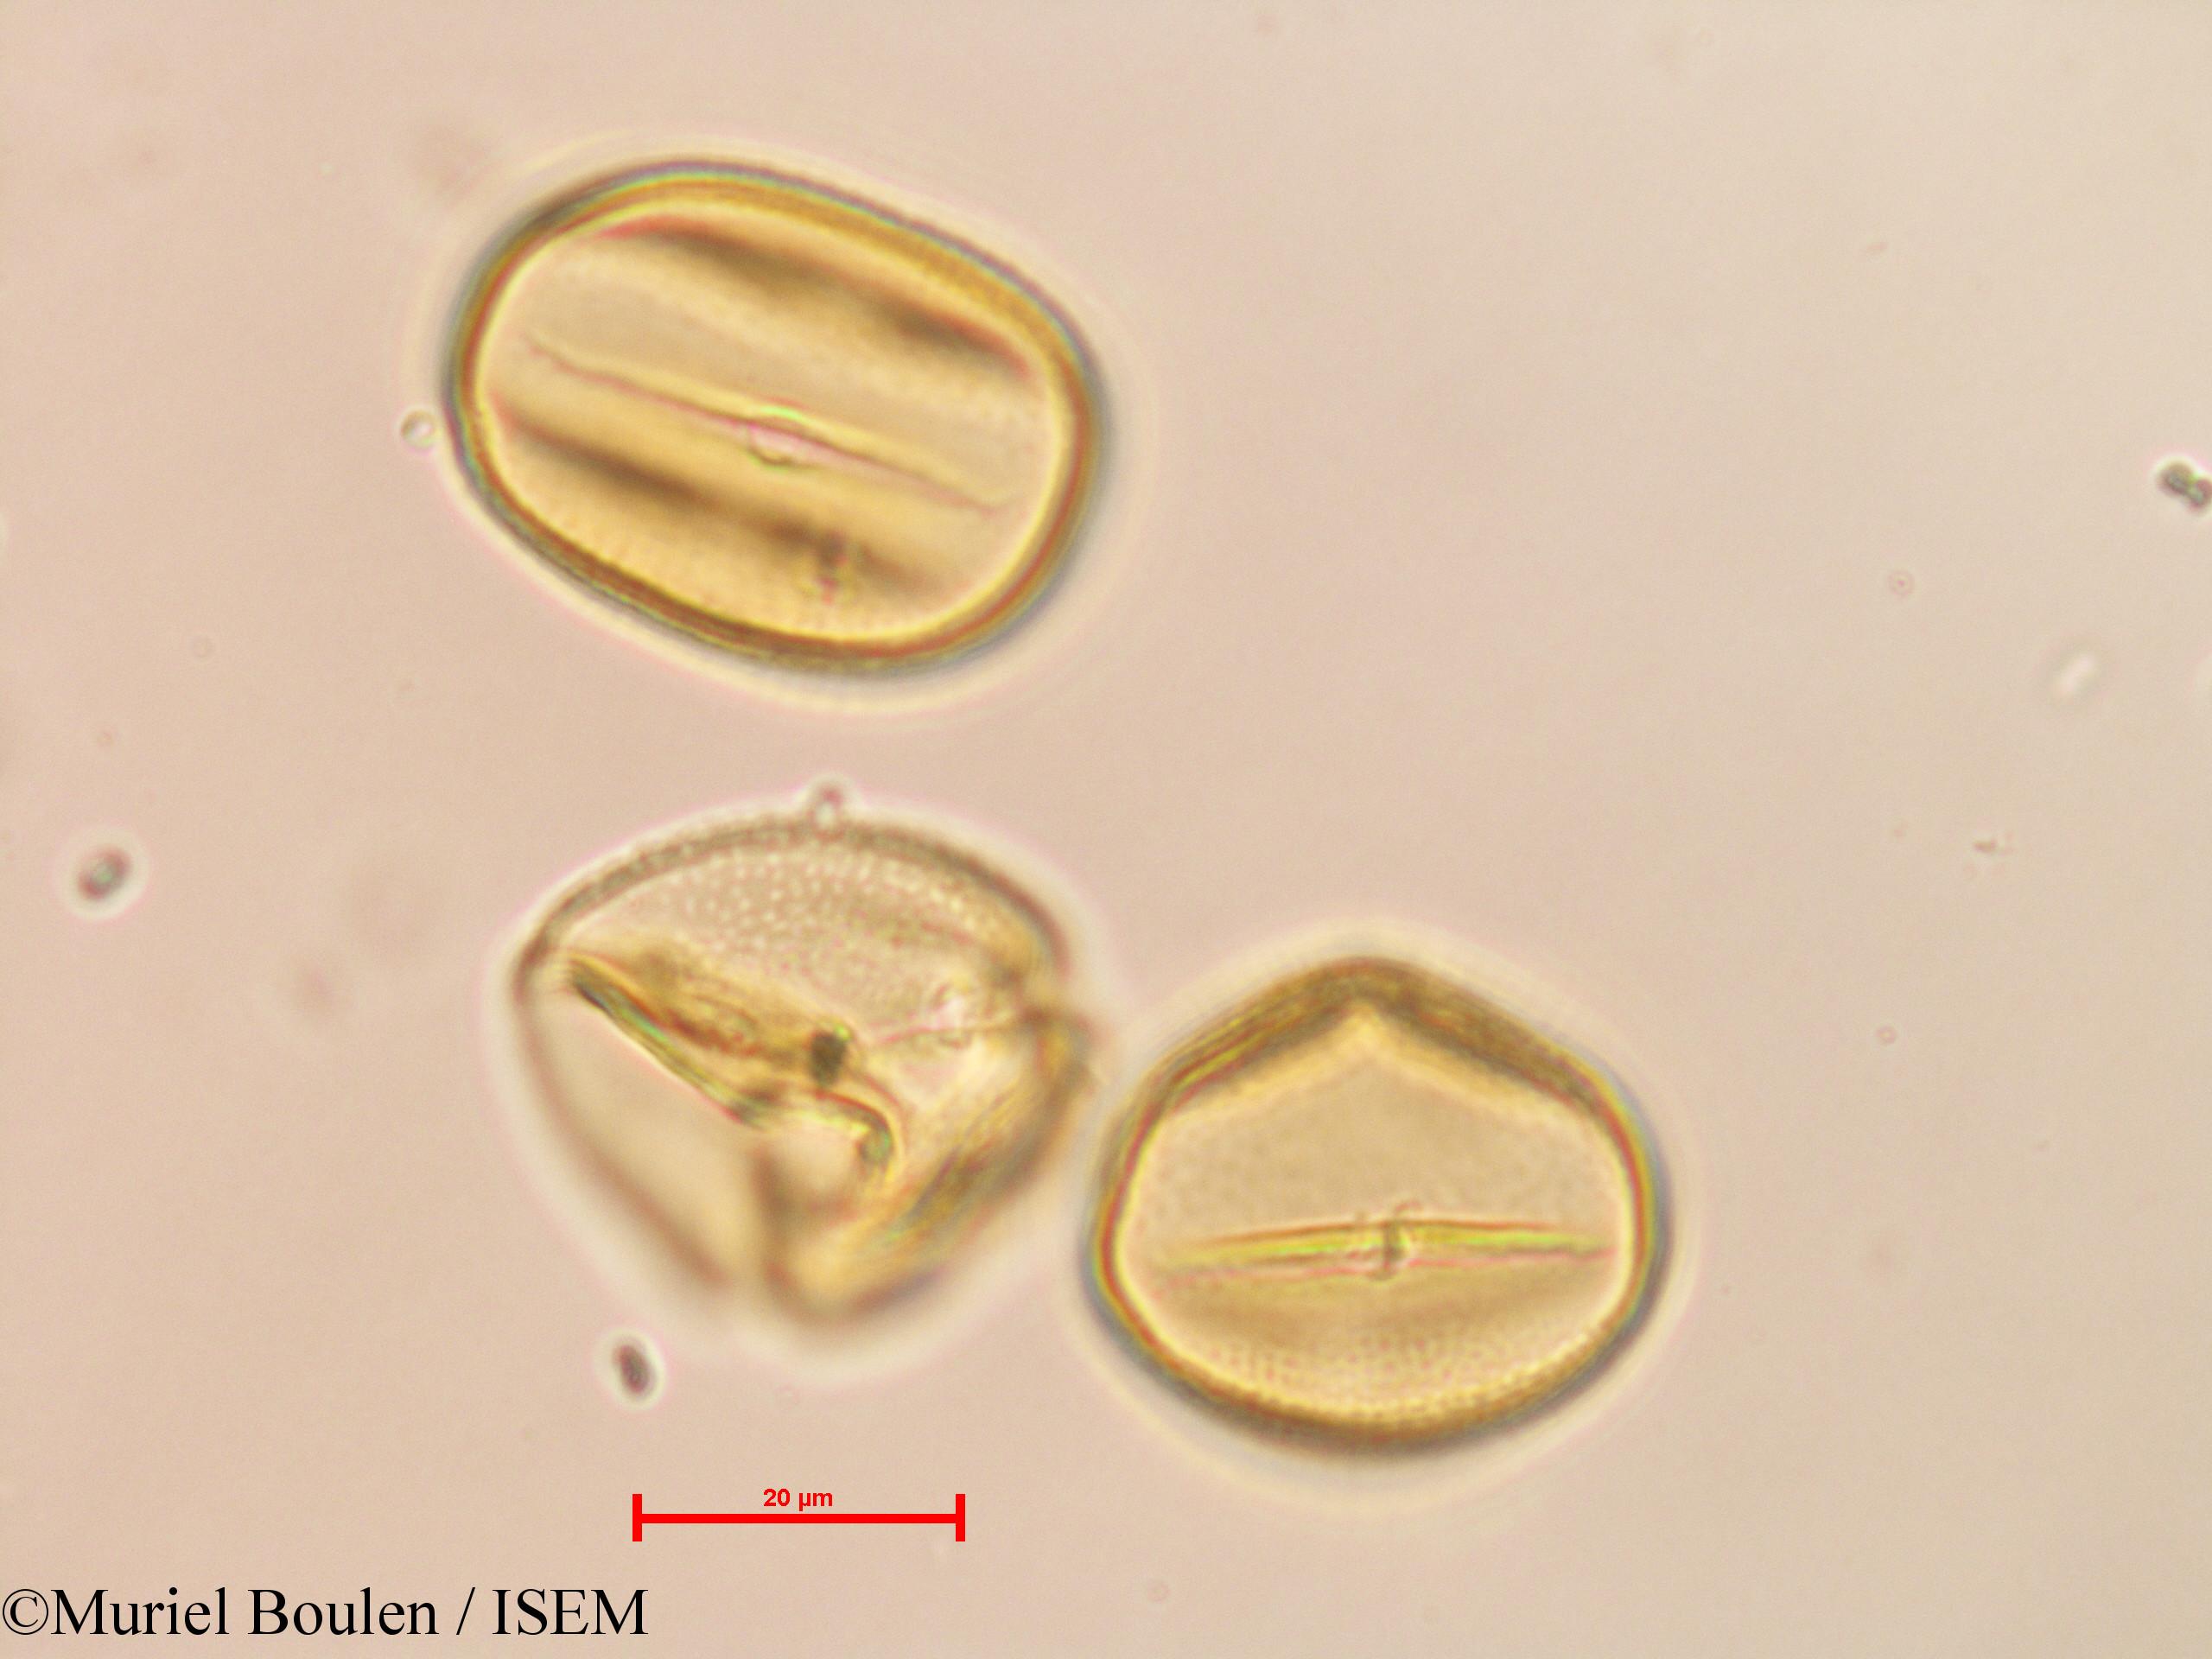 Muriel.Boulen/Phaseolus_pauciflorus_26414/Phaseolus_pauciflorus_26414_0003(copy).jpg